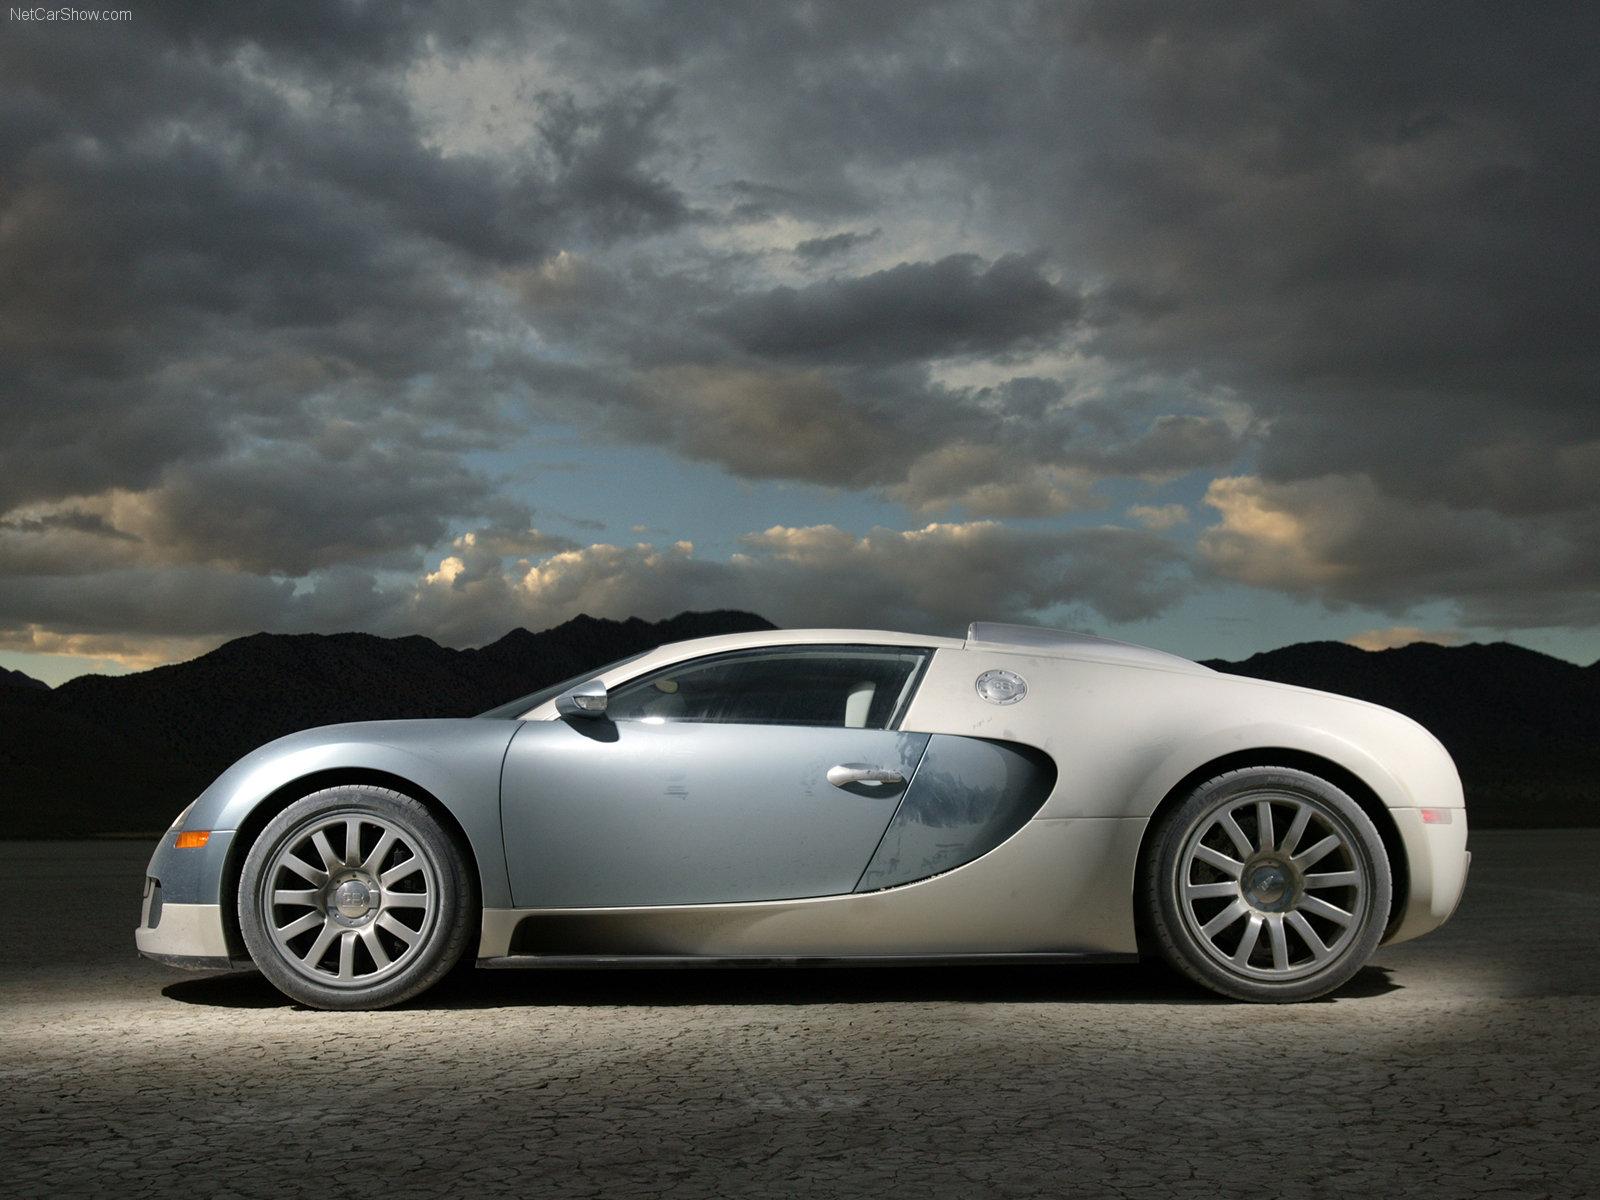 Bugatti Veyron Lion Smoke Power 2013 | El Tony